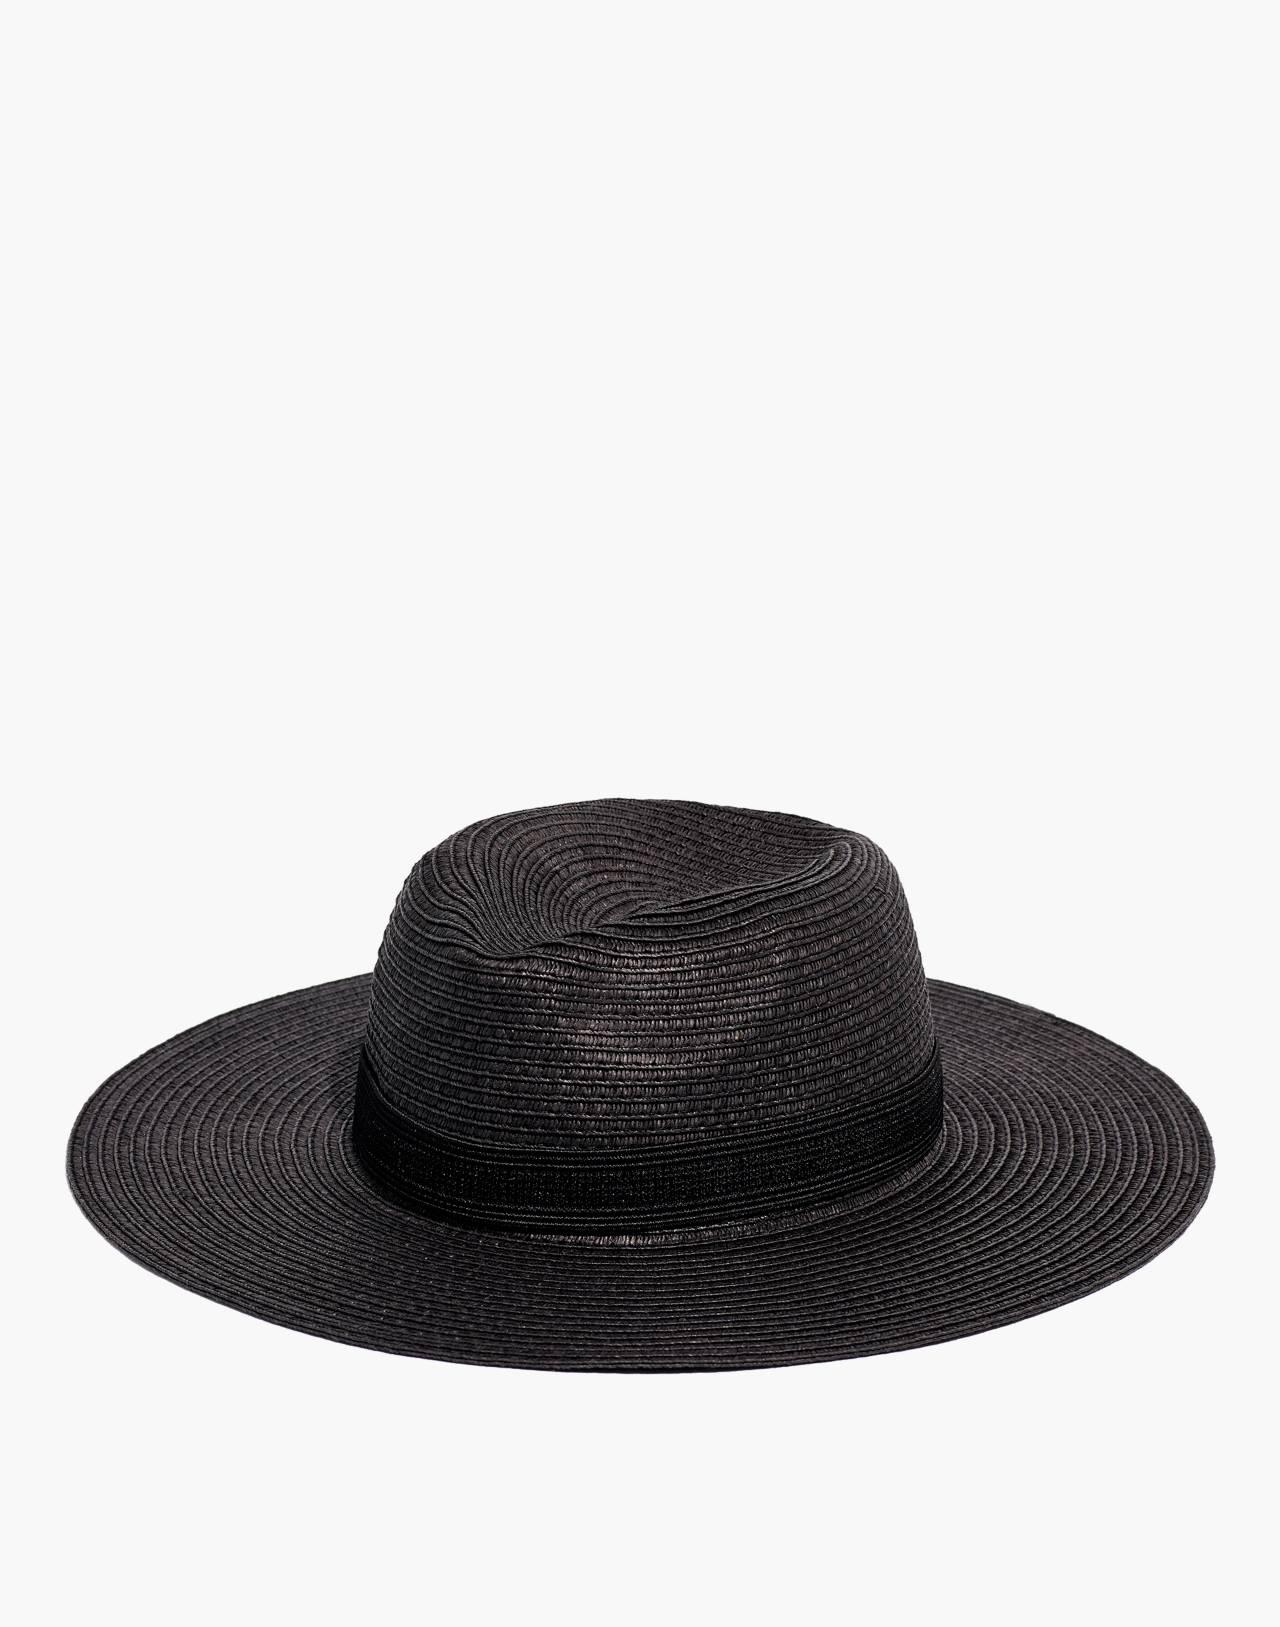 Packable Mesa Straw Hat in true black image 1